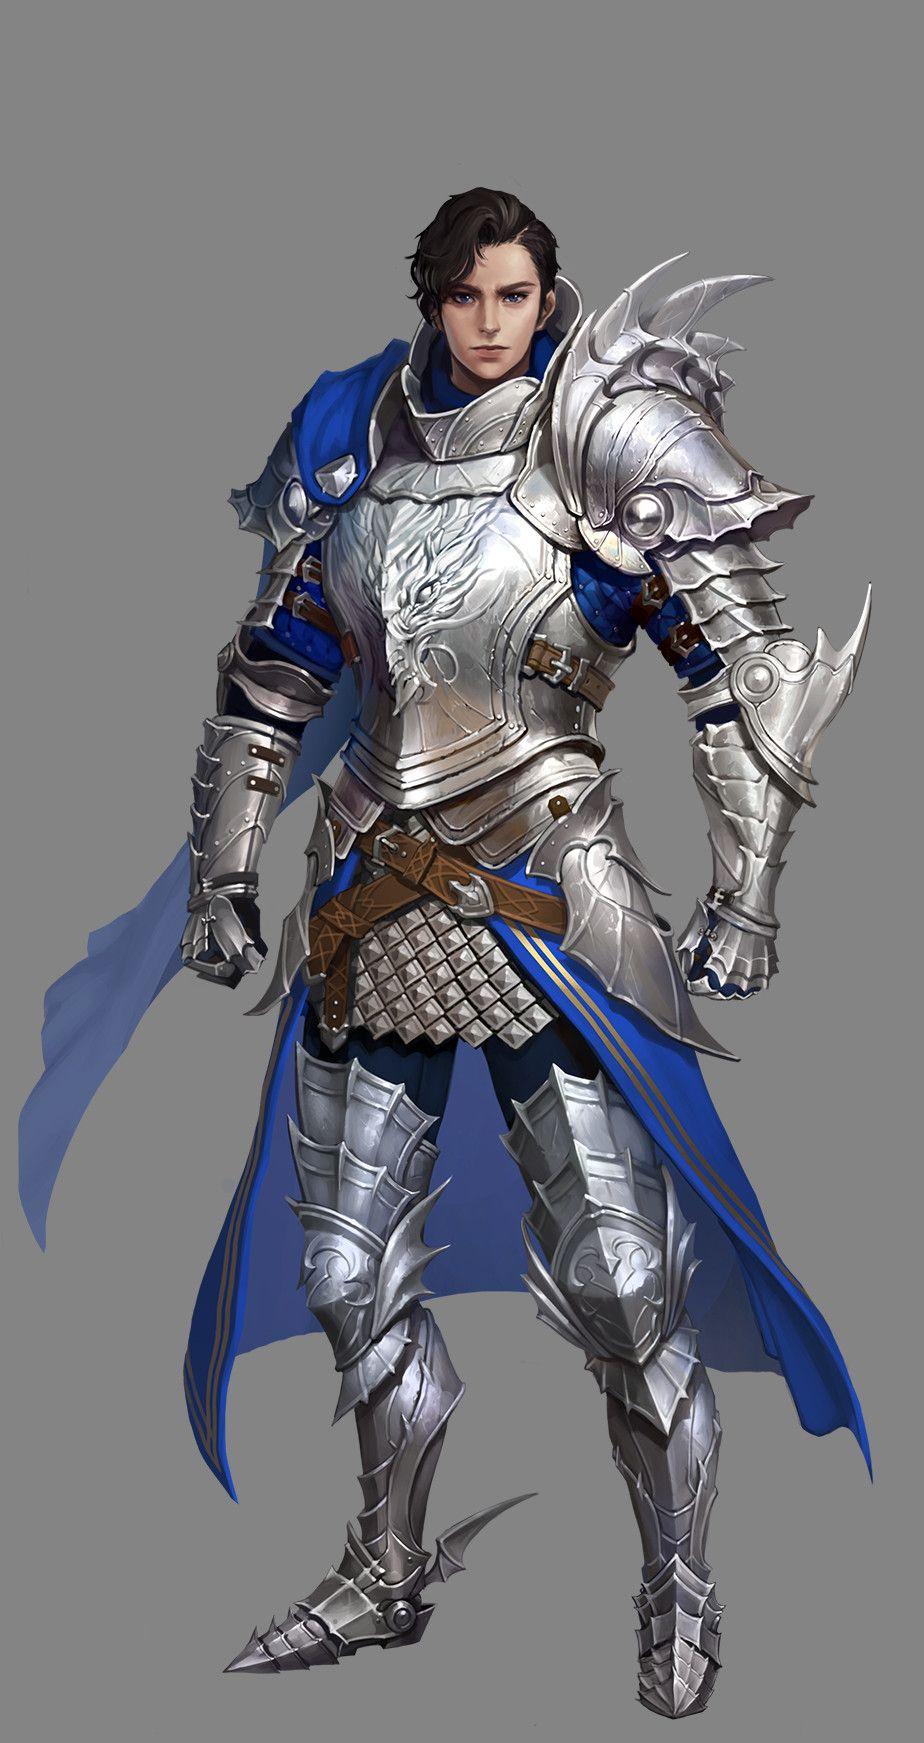 Artstation Dragon Rider 6 2 Fantasy Armor Dragon Rider Dragon Armor Add several armor sets and a dragon to the game. fantasy armor dragon rider dragon armor